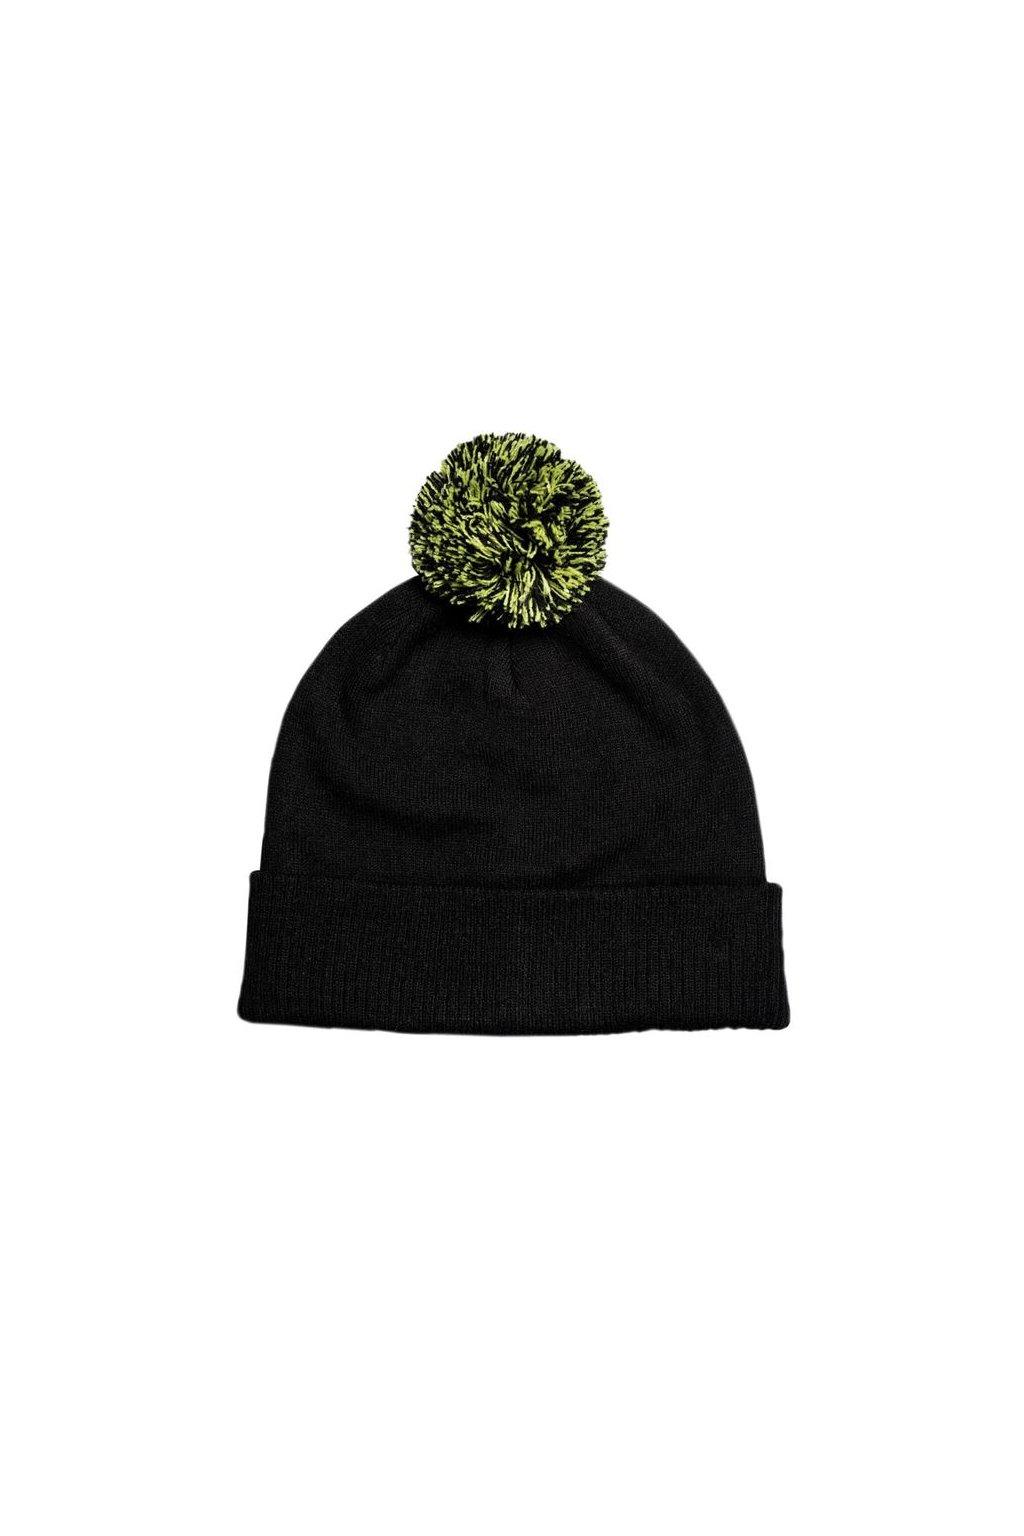 RidgeMonkey: Čepice APEarel Dropback Bobble Hat Black